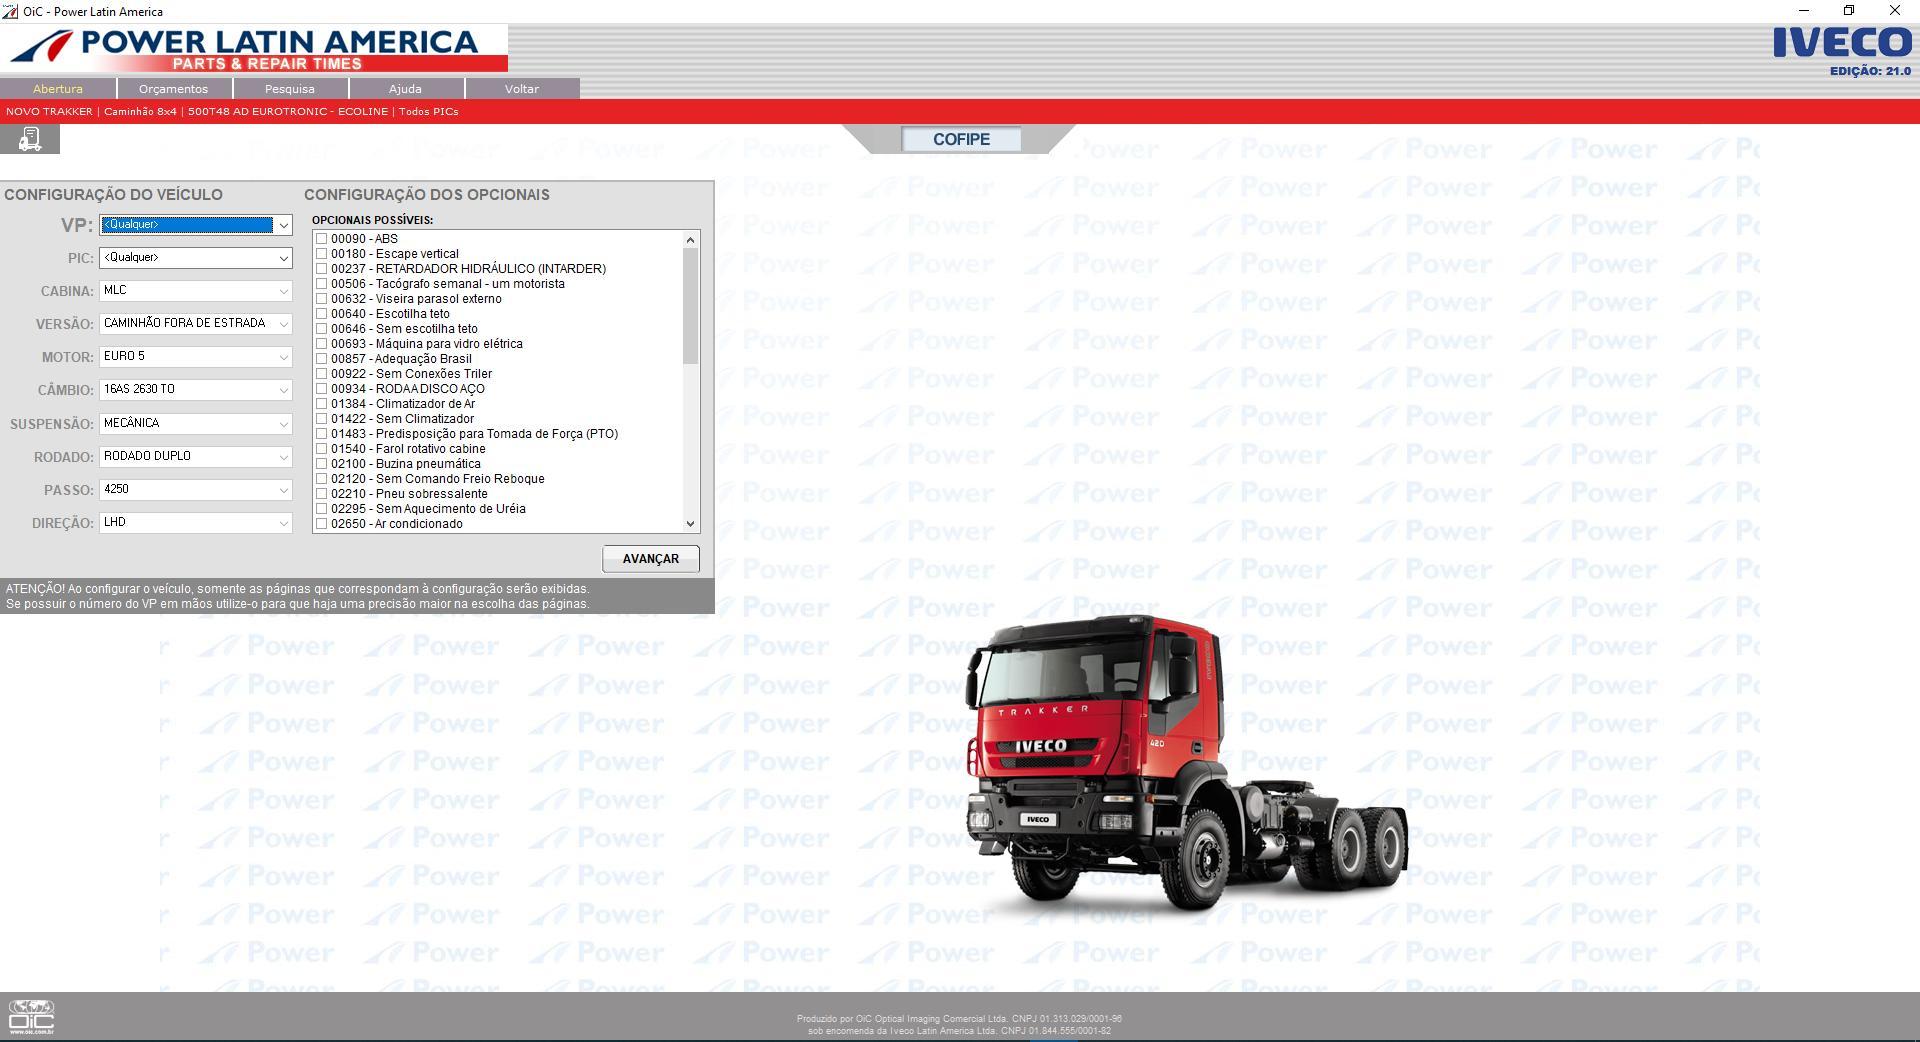 Iveco_Power_Latin_America_OIC_032020_EPC_Spare_Parts_Catalog10